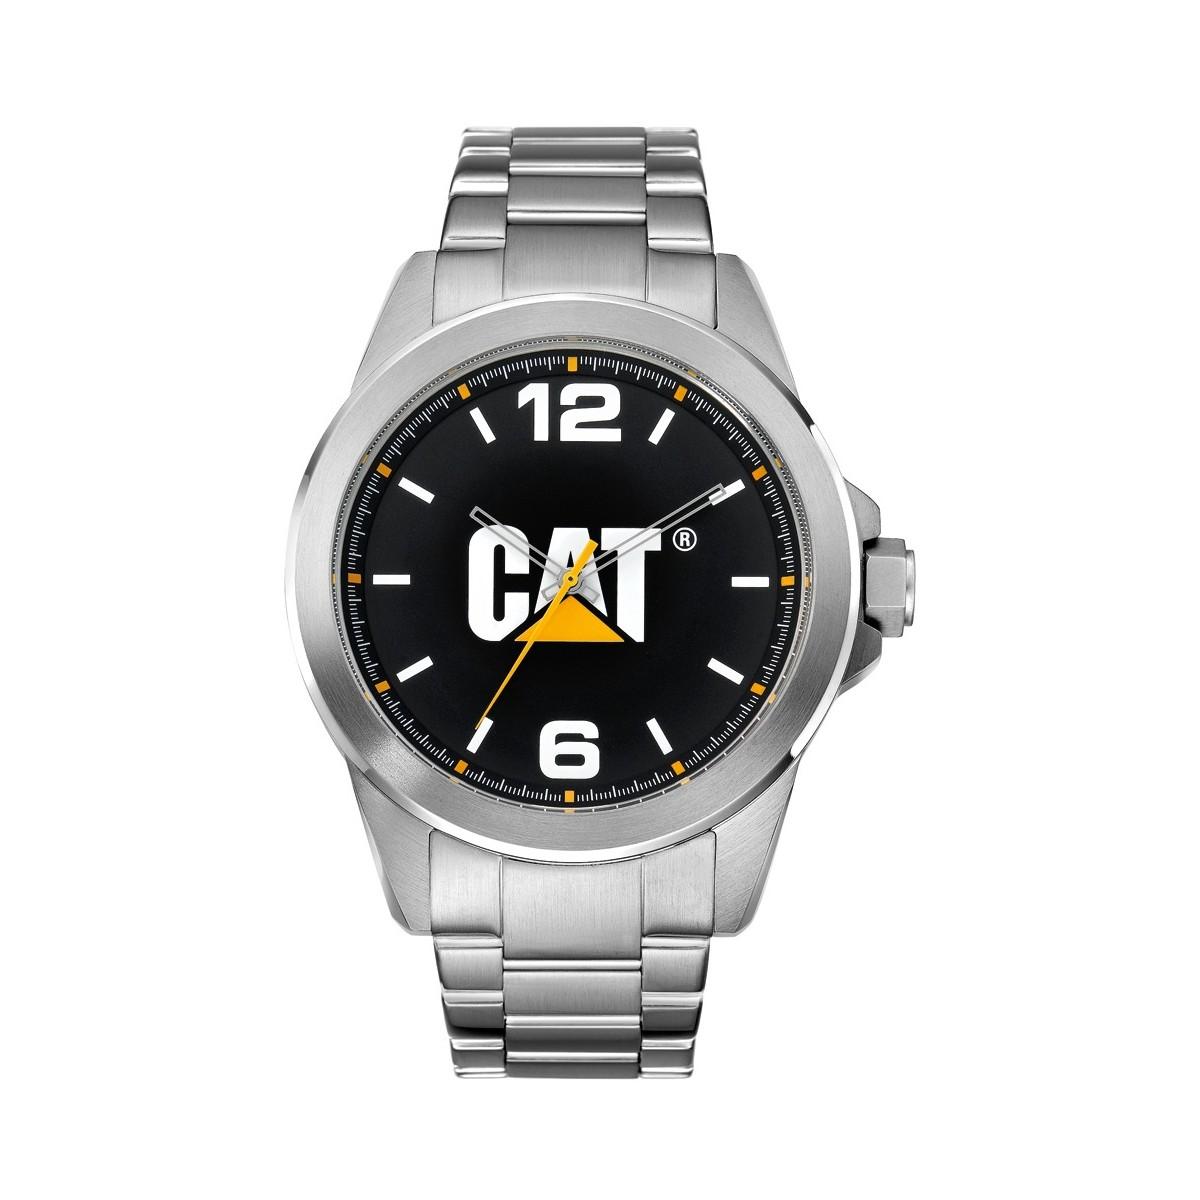 https://www.gaberjoyeria.com/3554-thickbox_default/reloj-cat-ys-14011131.jpg